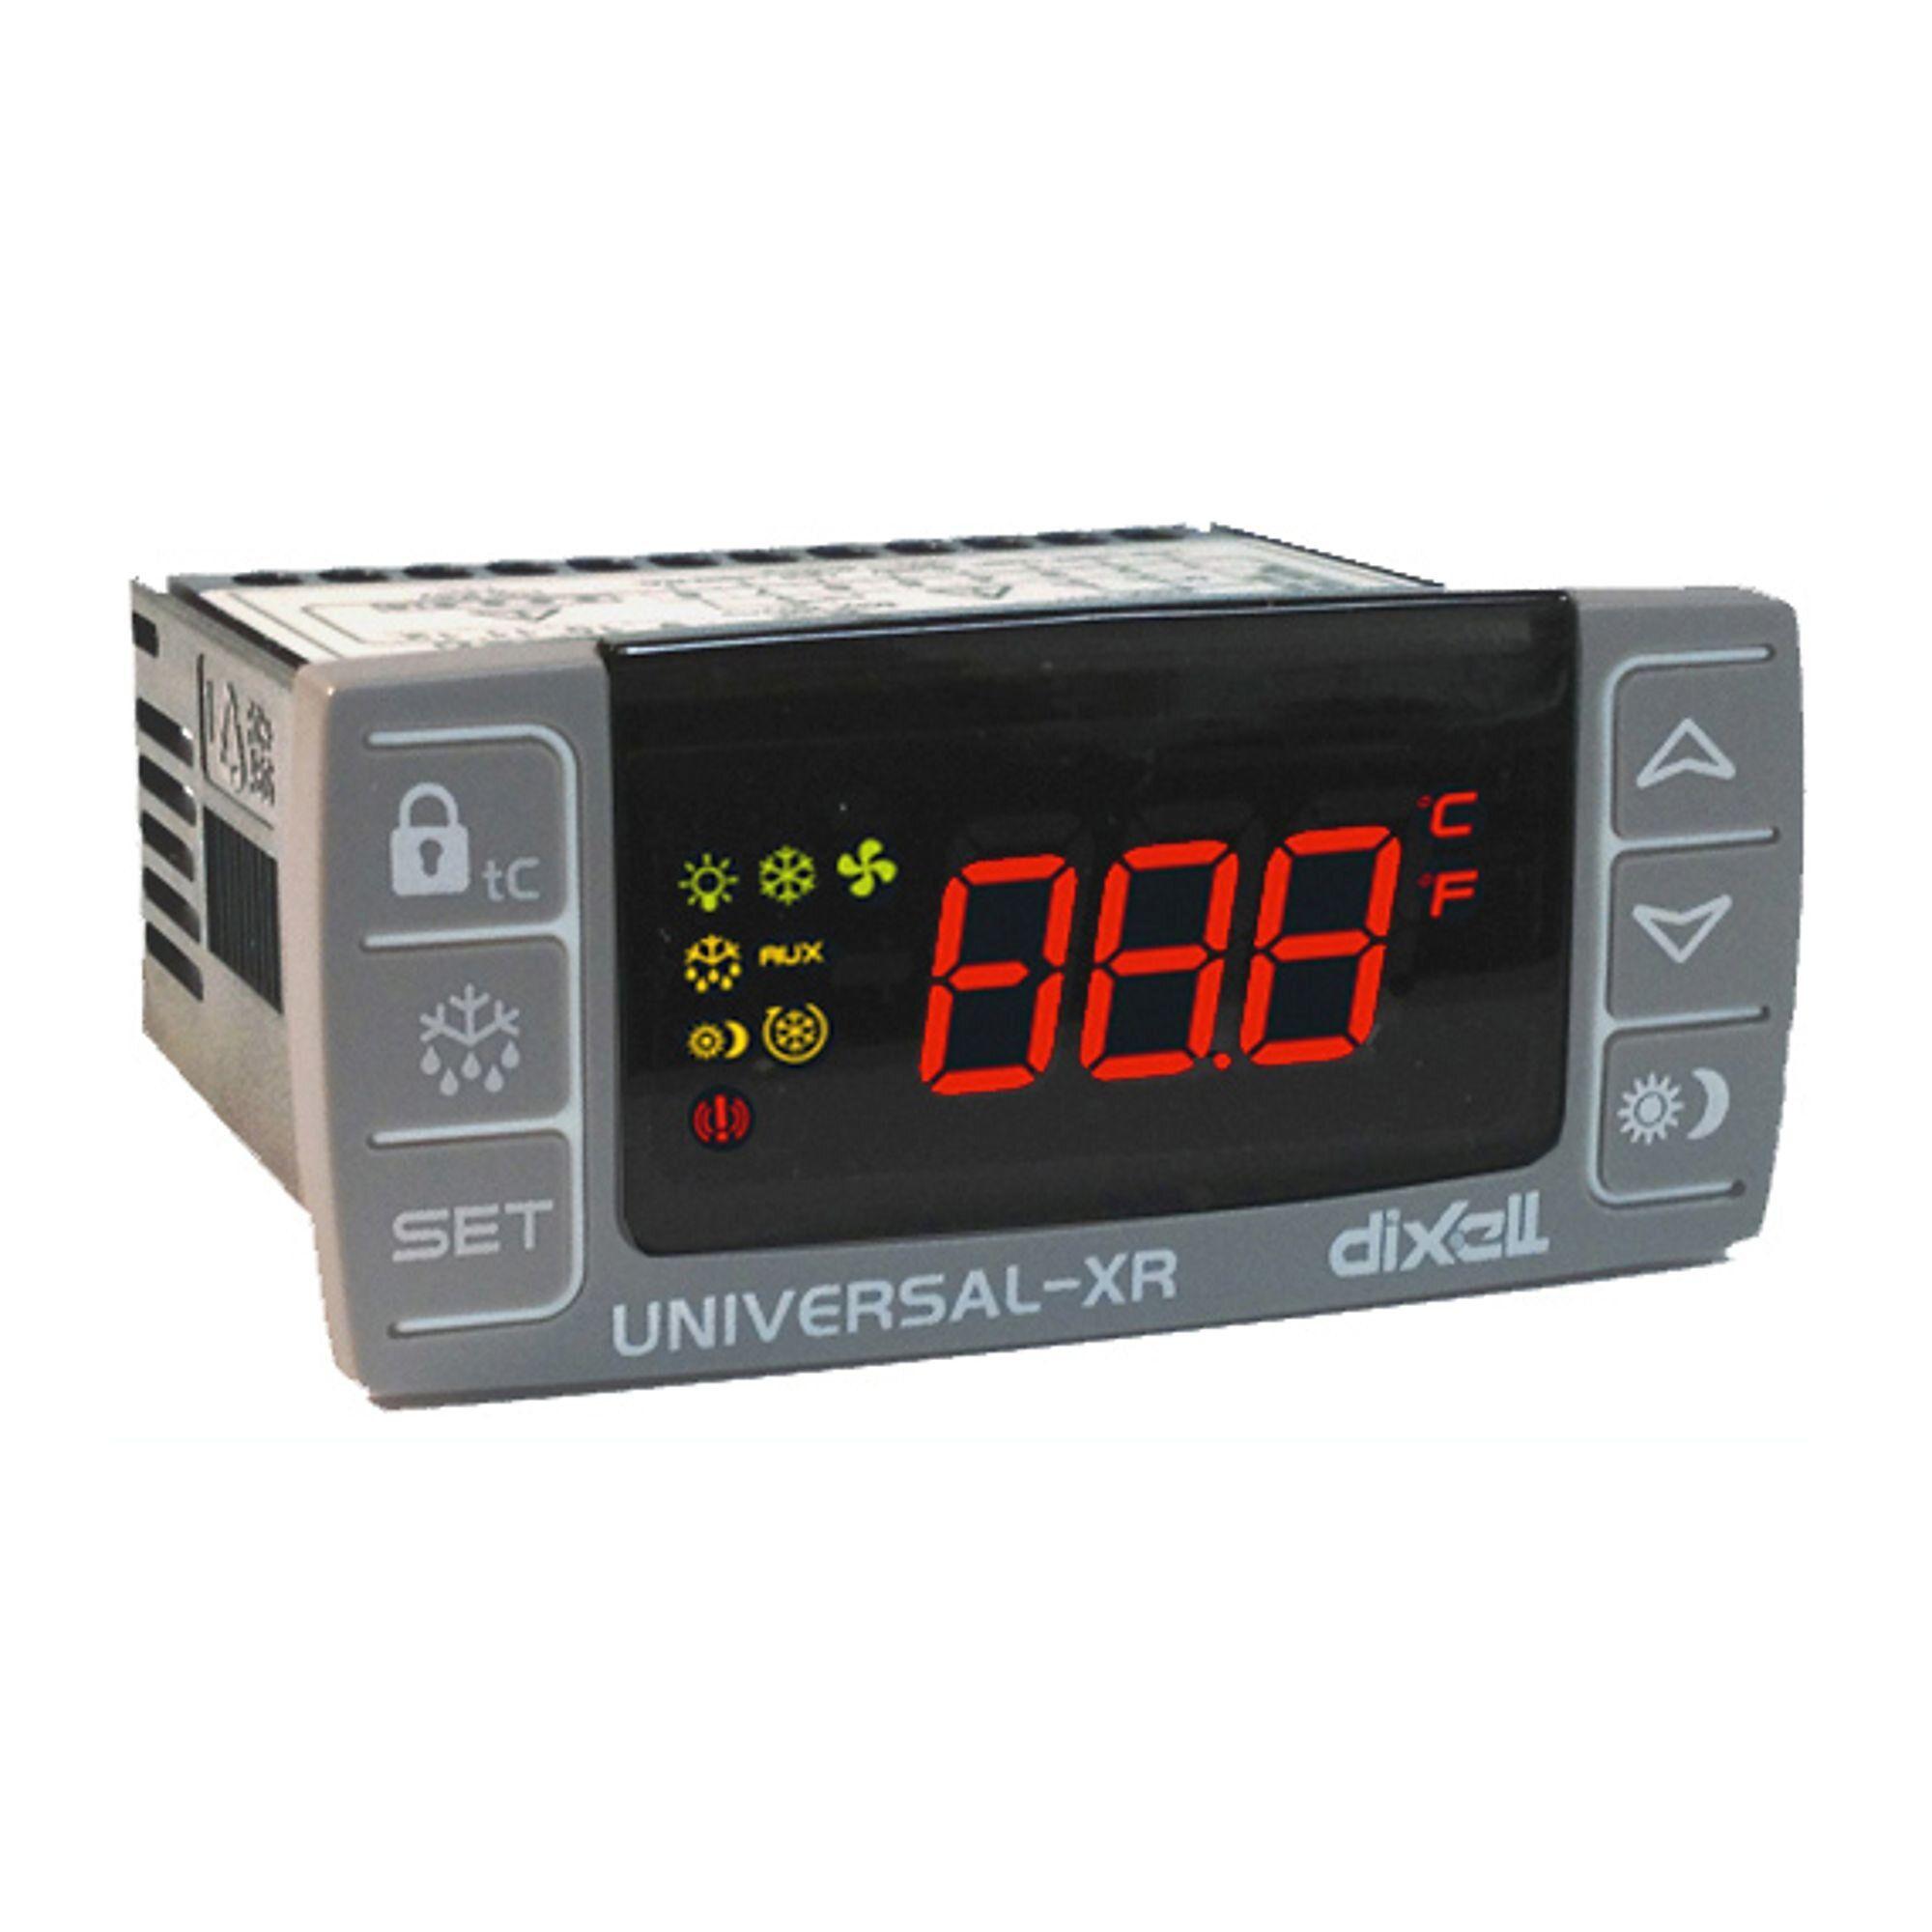 Weiss Instruments Xr60cx 5n1f1 Ur Universal Xr Controller 240v Diy Parts Universal Instruments Control